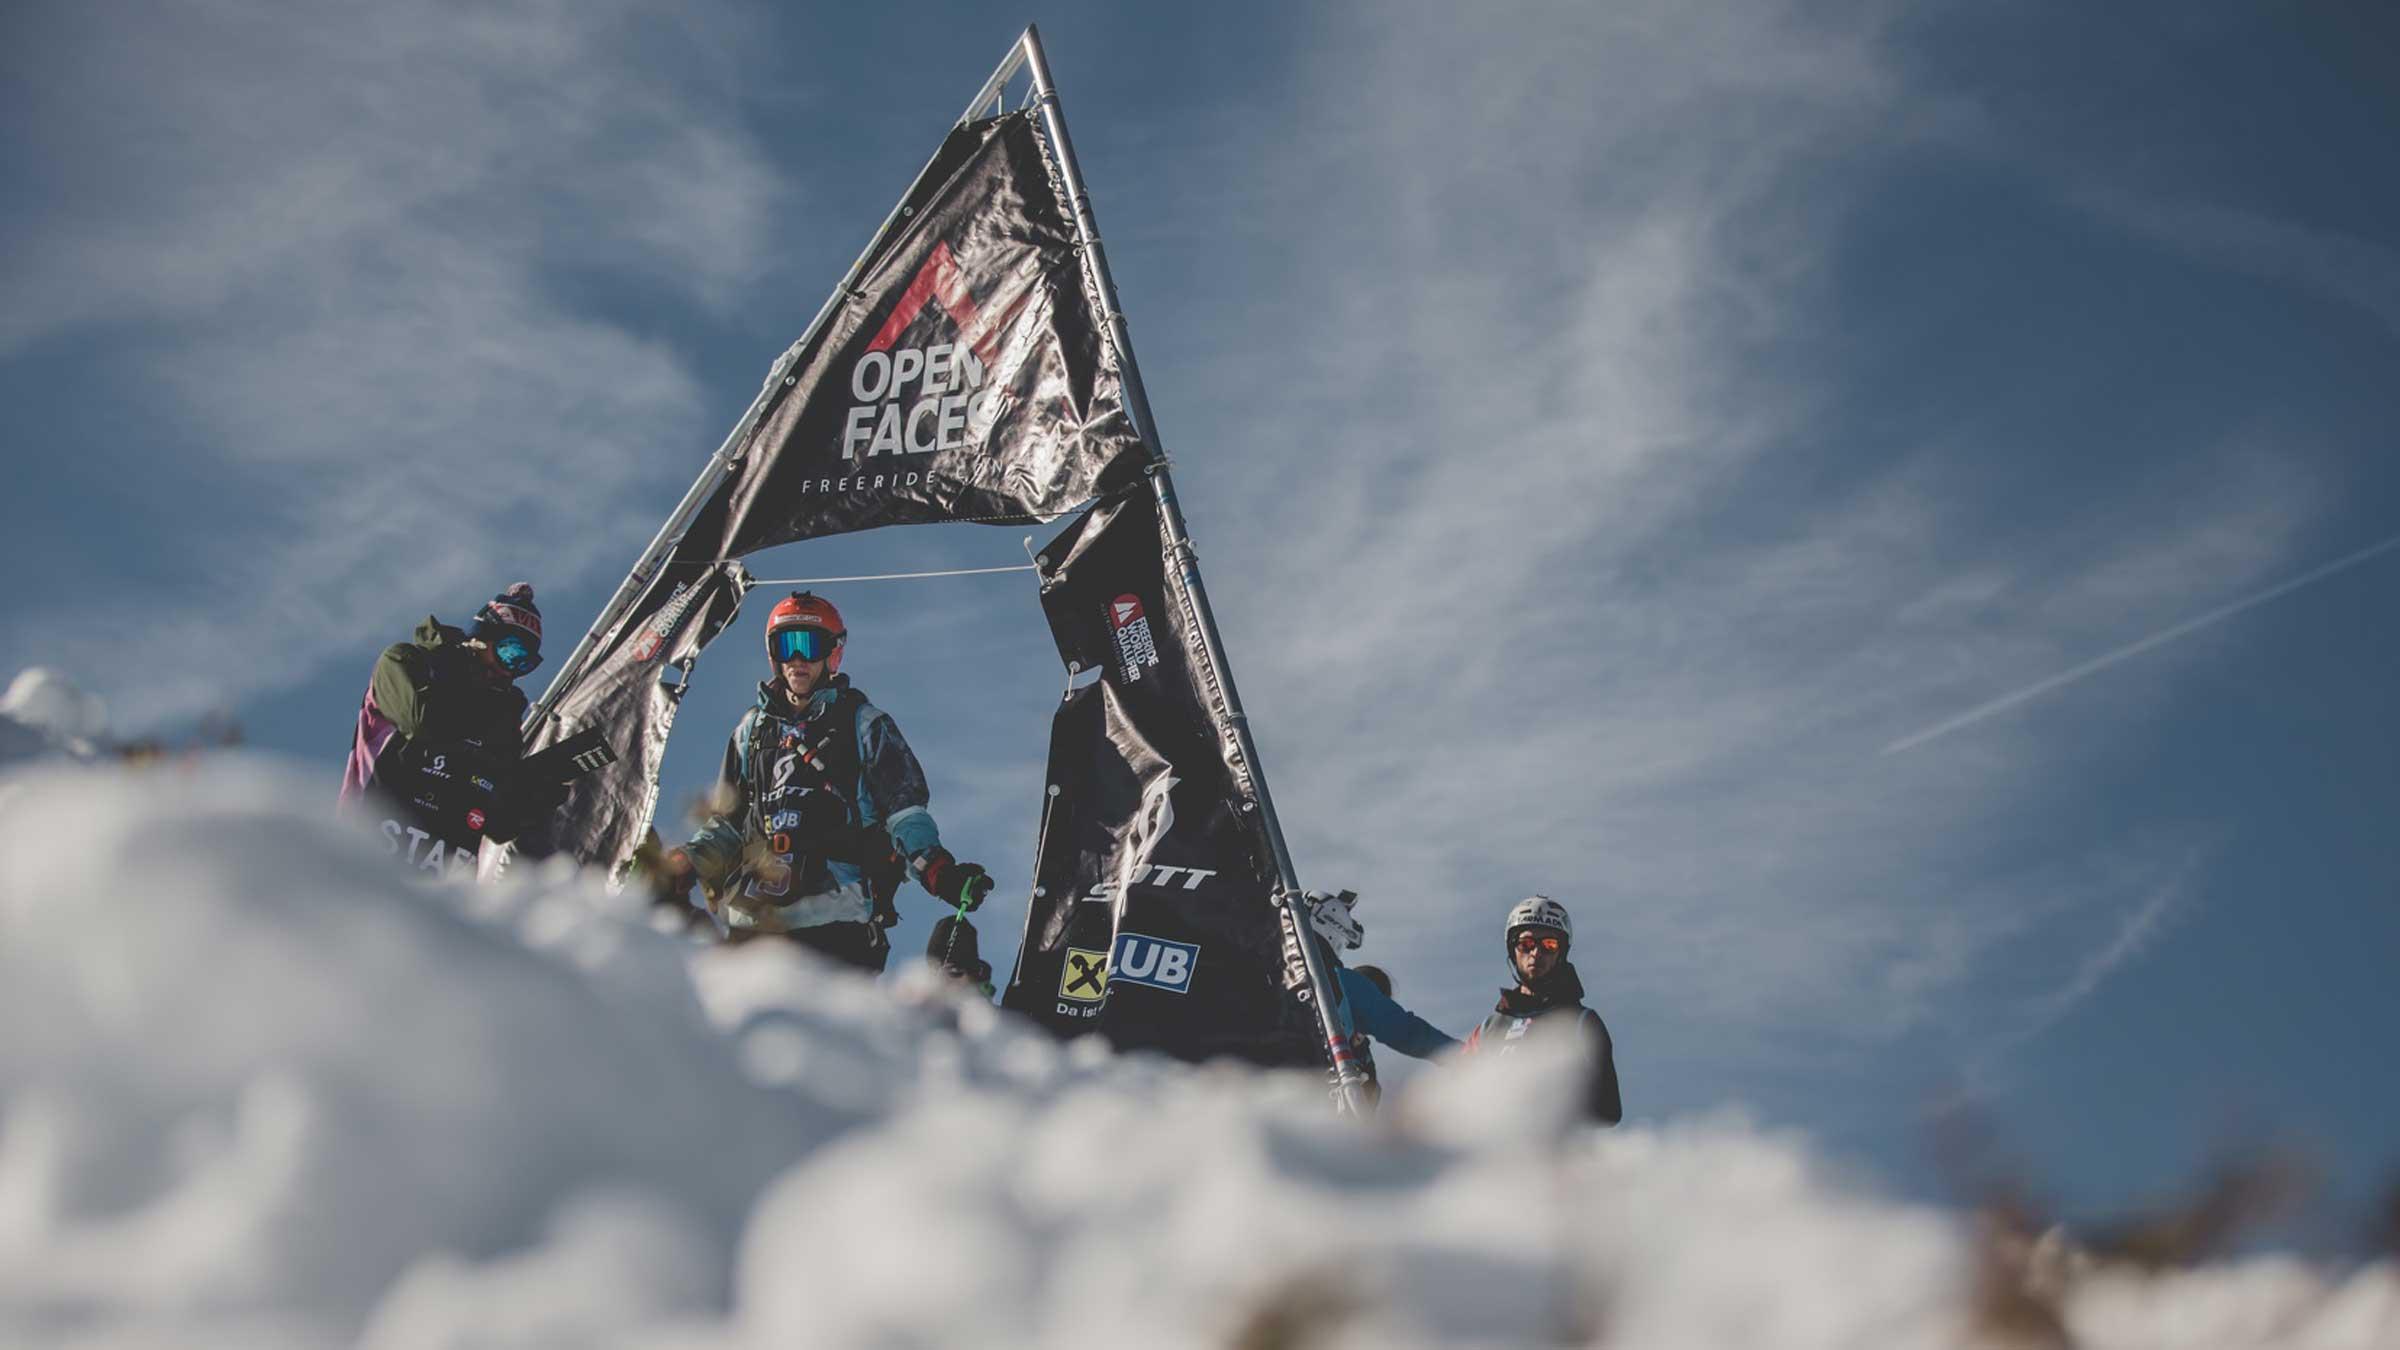 Skifahrer am Start - OPEN FACES Obergurgl-Hochgurgl